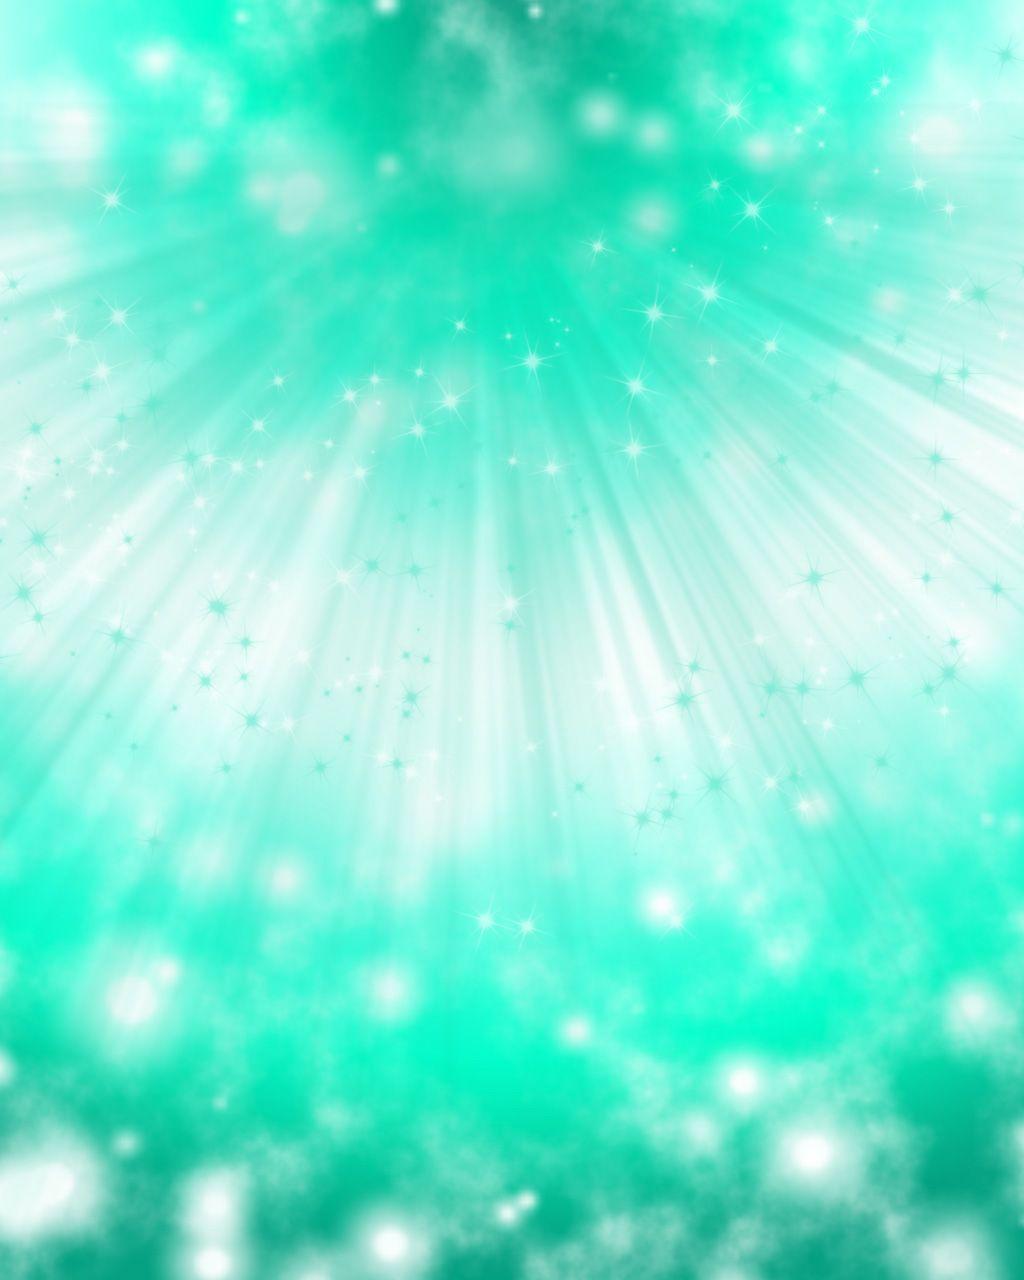 Green Desktop Wallpaper: Sea Green Sparkles Background By YuniNaoki.deviantart.com